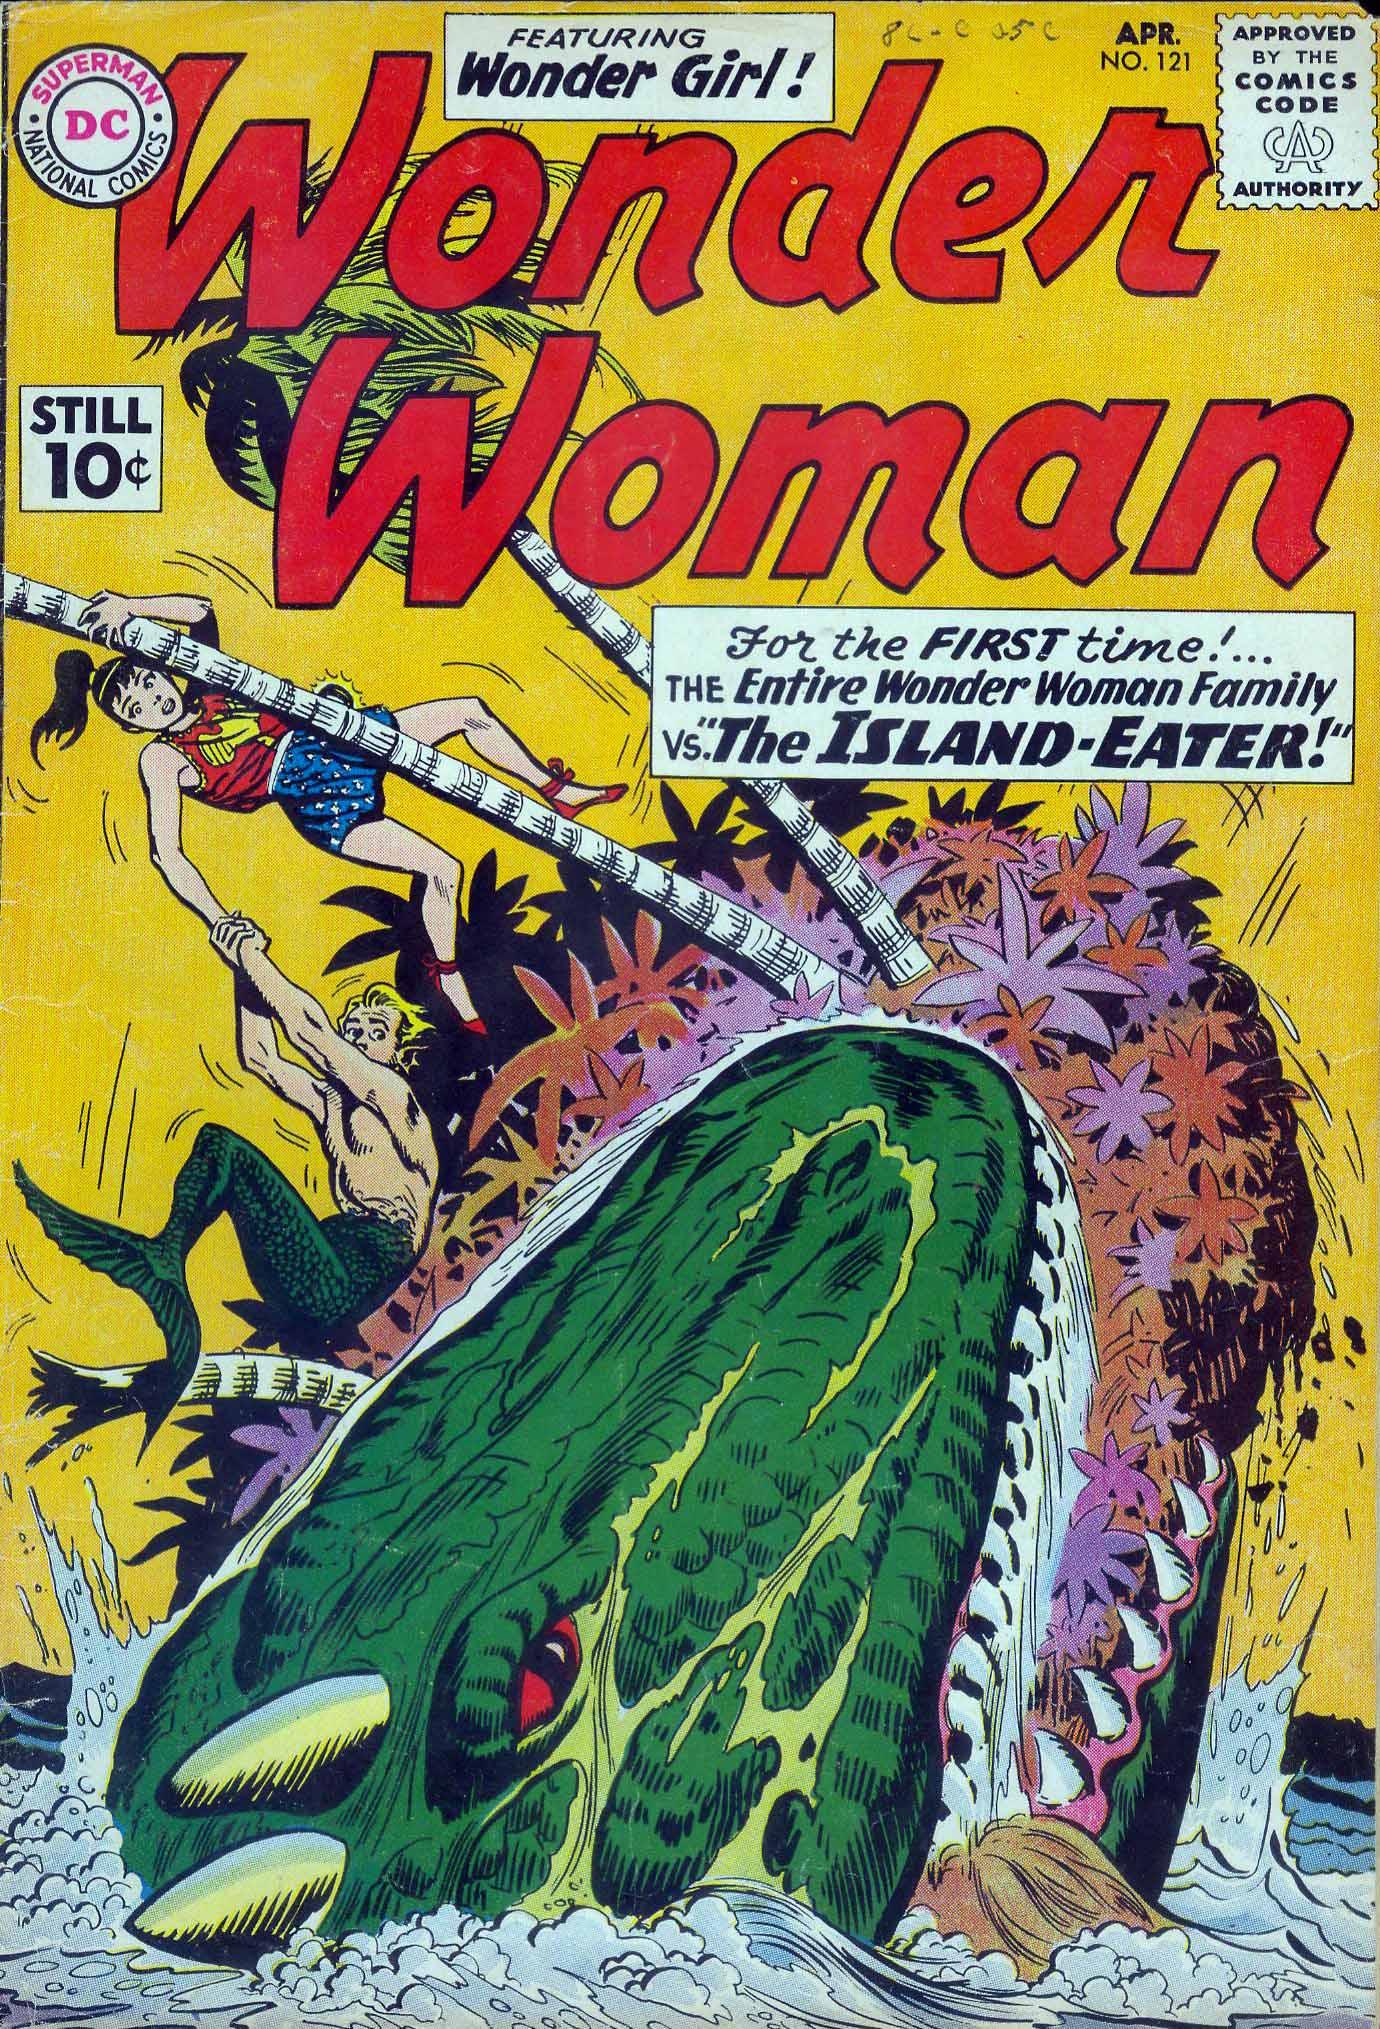 Read online Wonder Woman (1942) comic -  Issue #121 - 1